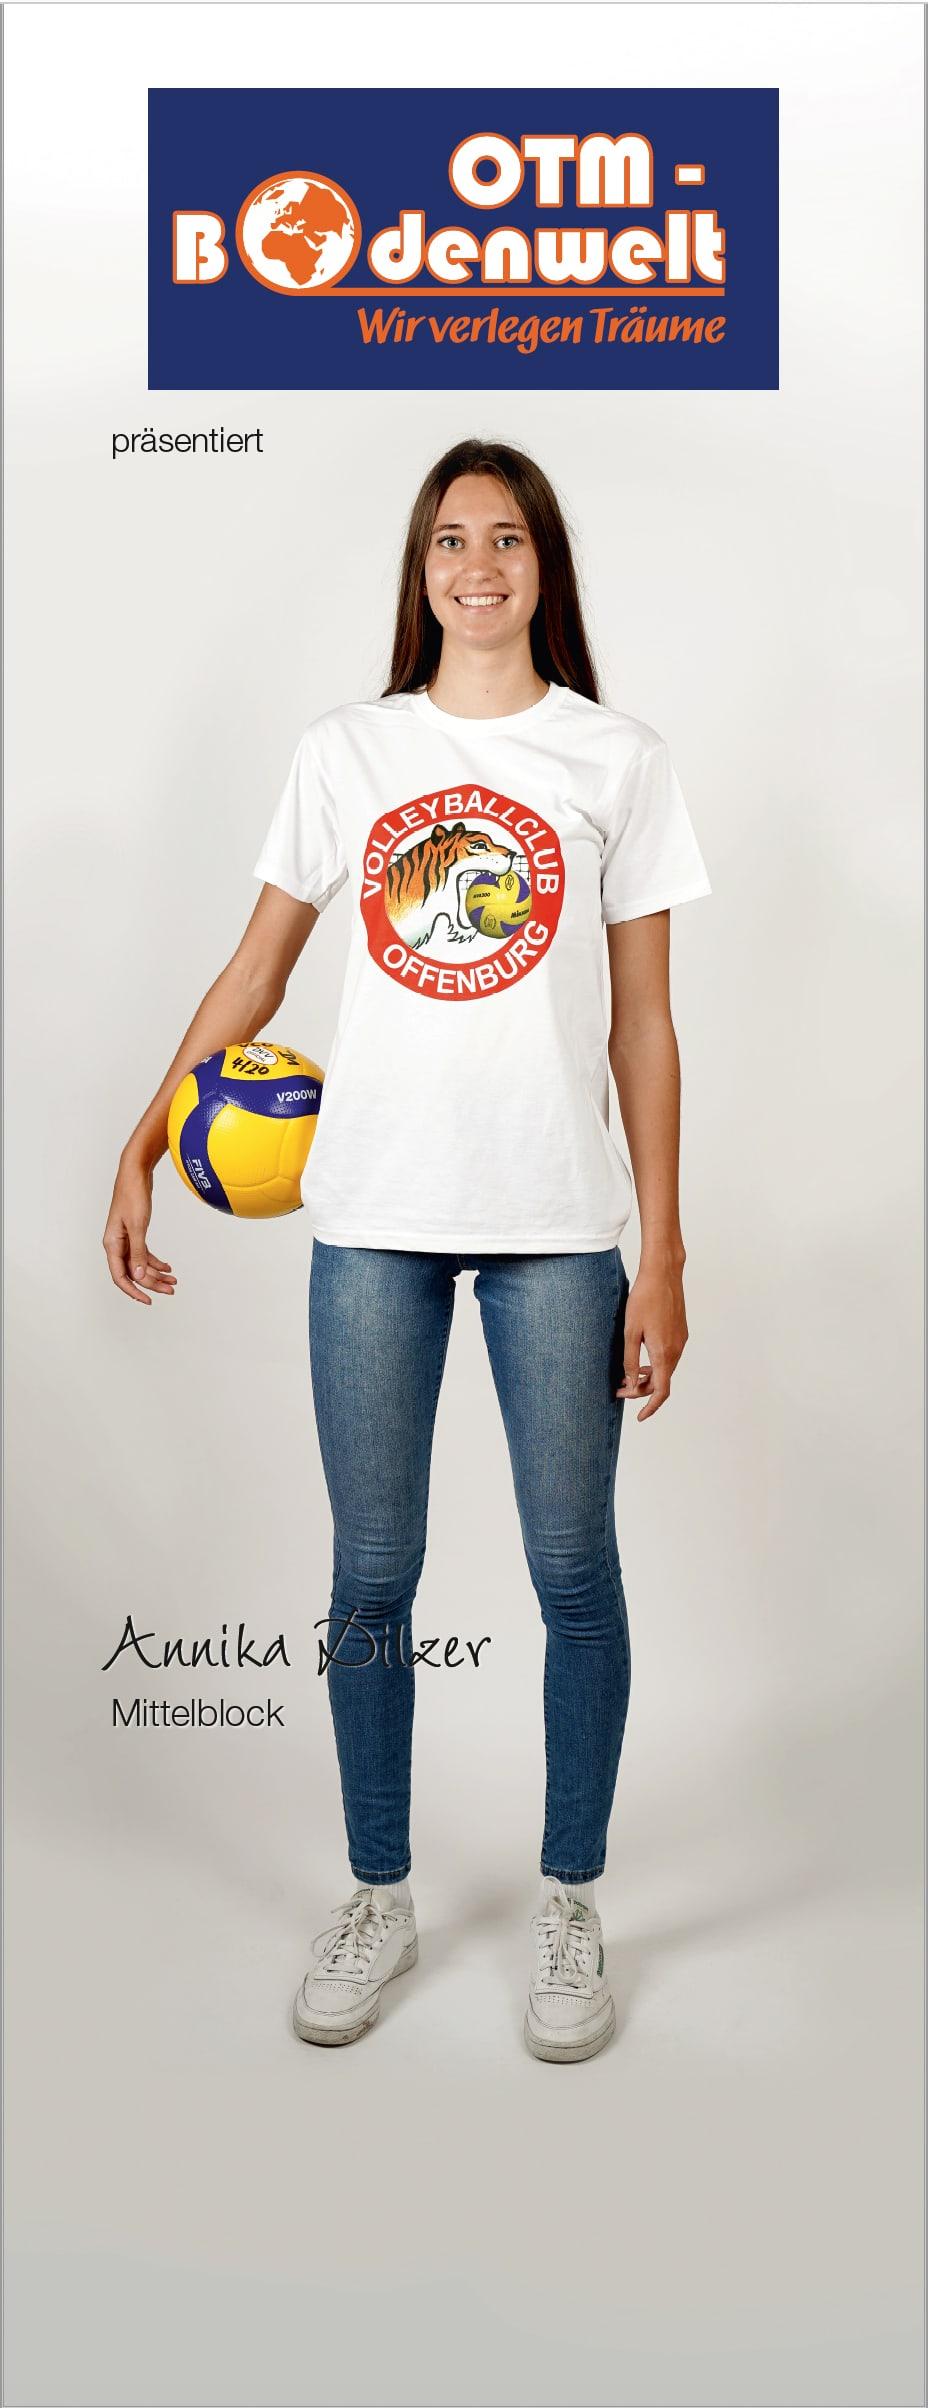 Annika Dilzer